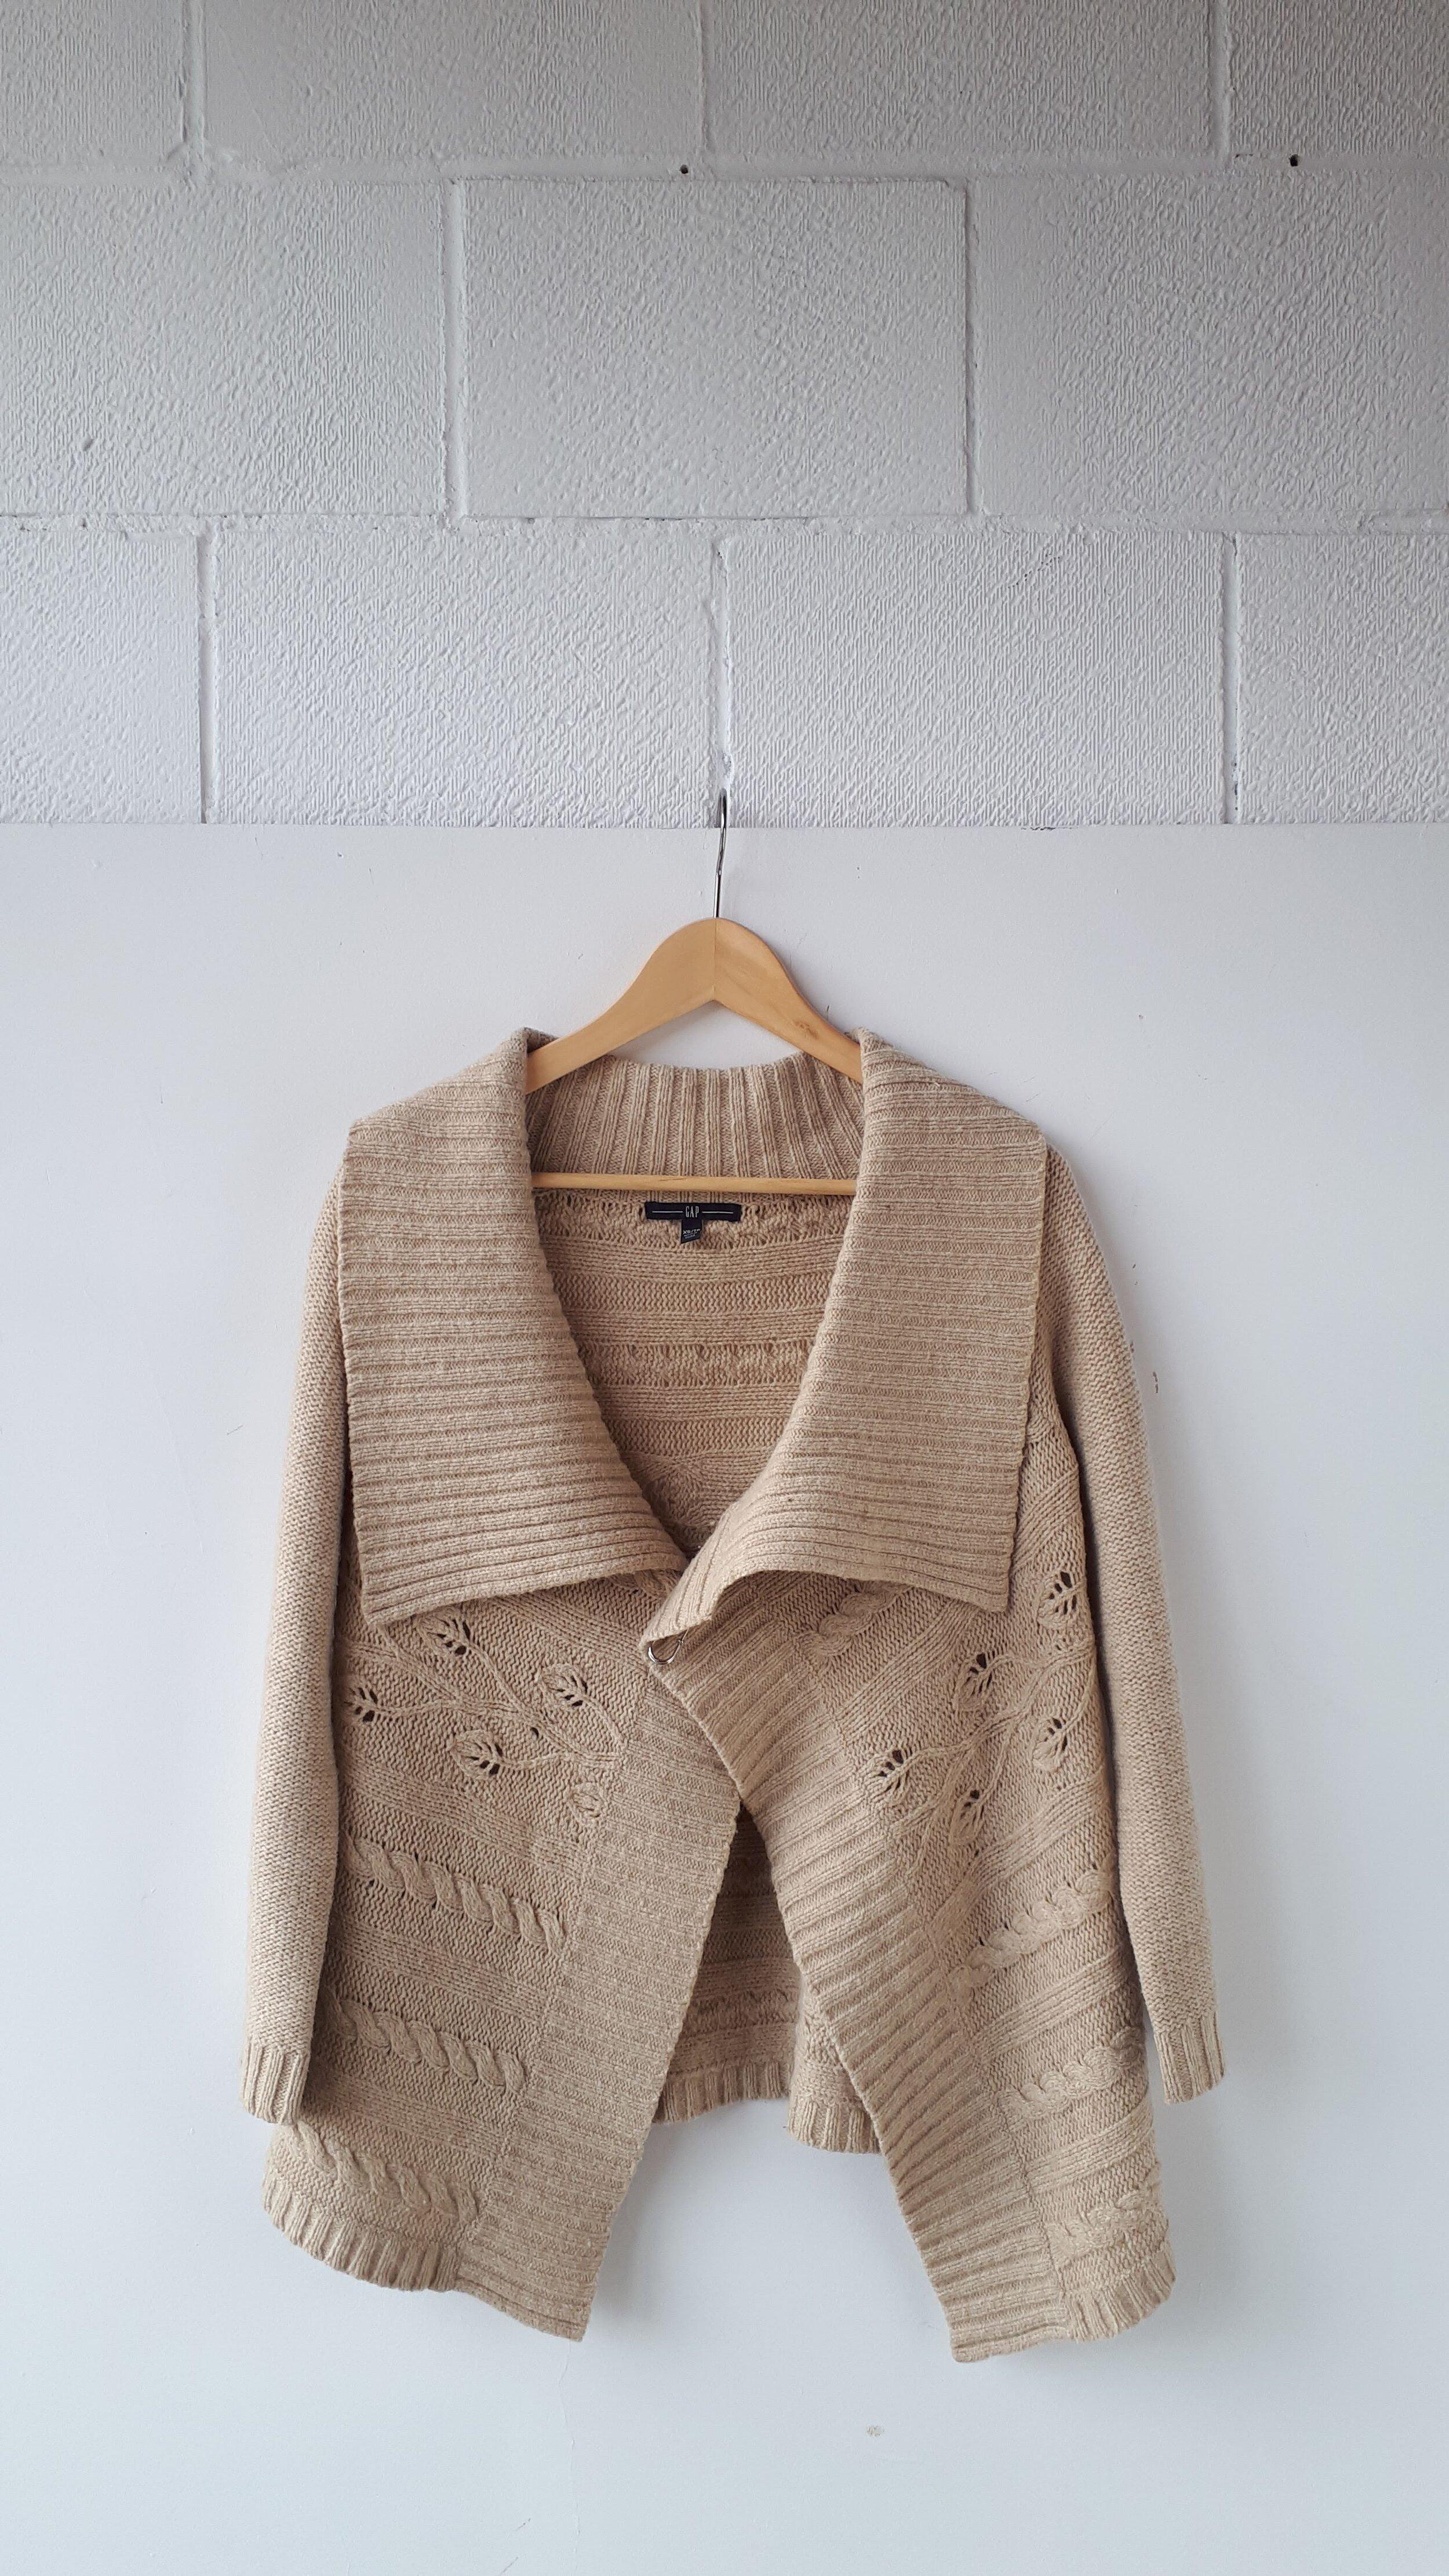 Gap sweater; Size S, $28